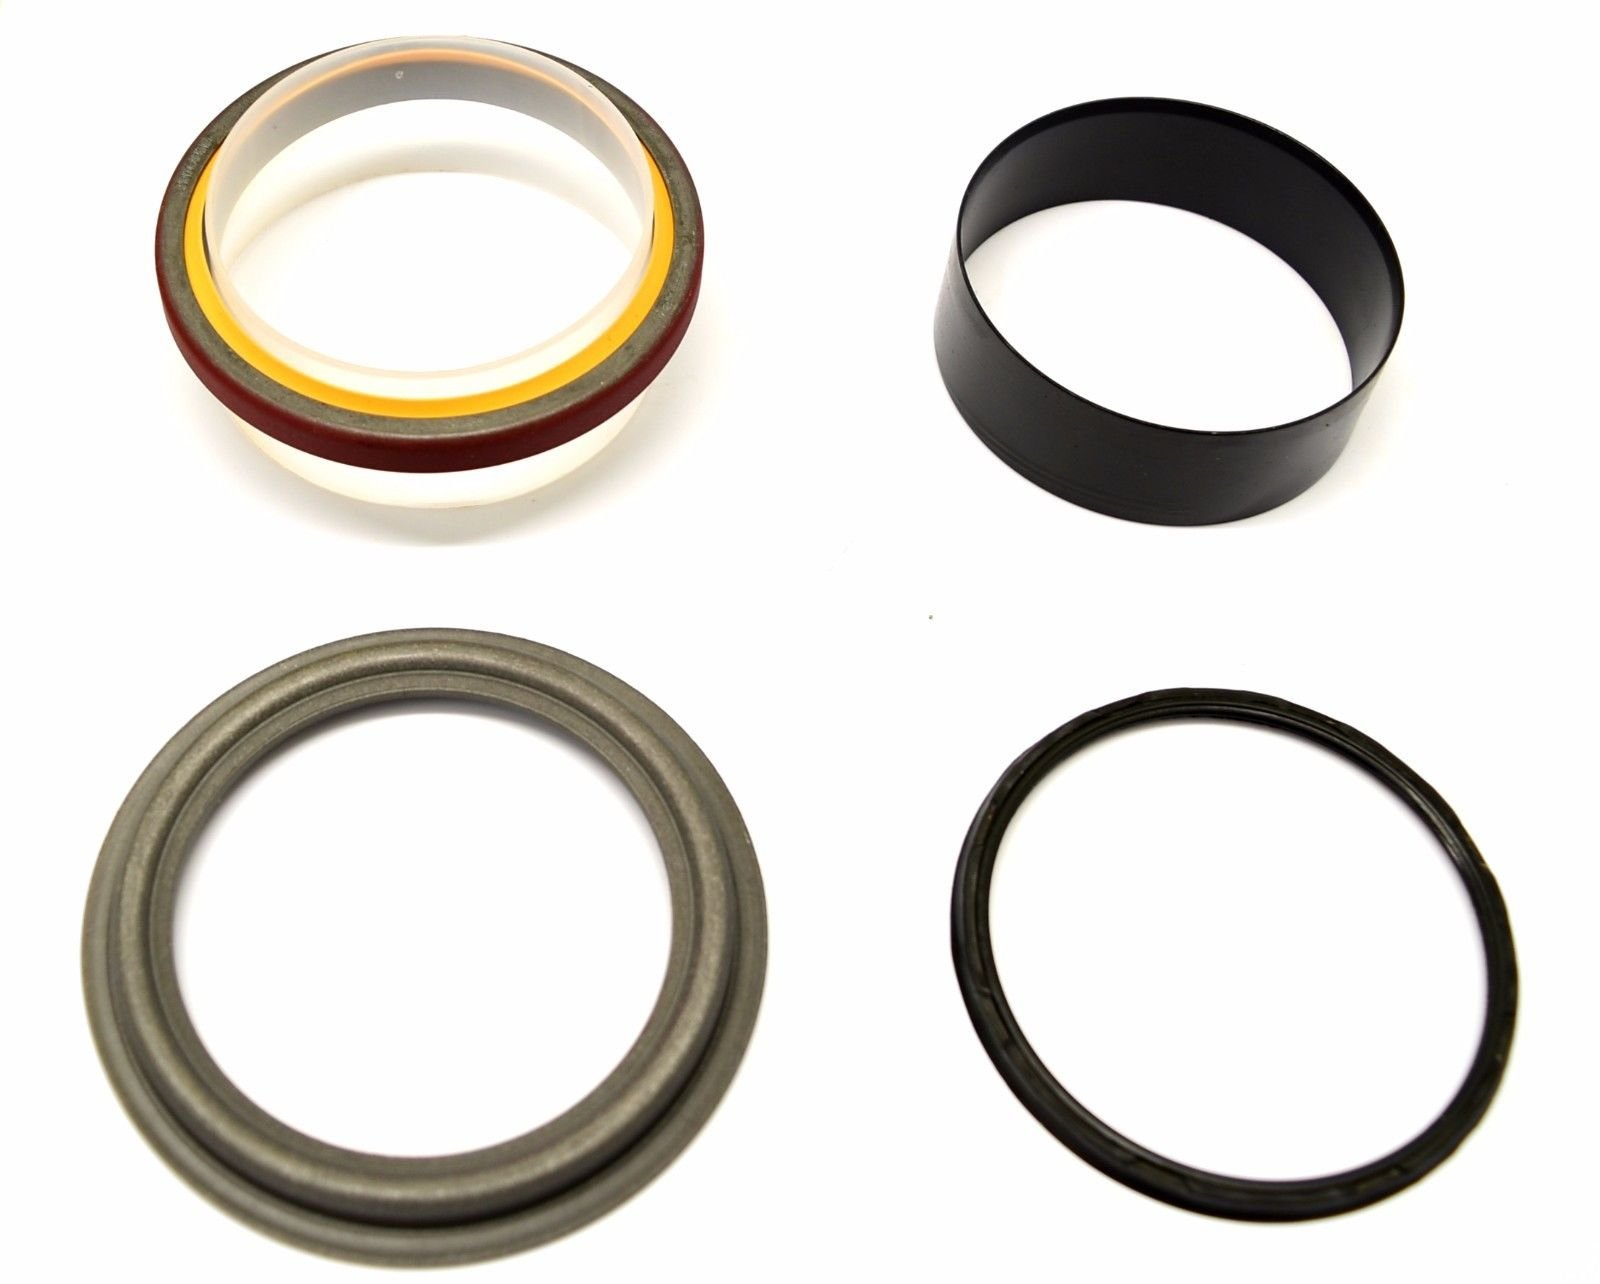 3802820 5.9L Front Main Crankshaft Oil Seal&Wear Sleeve for 89-15 Dodge Cummins